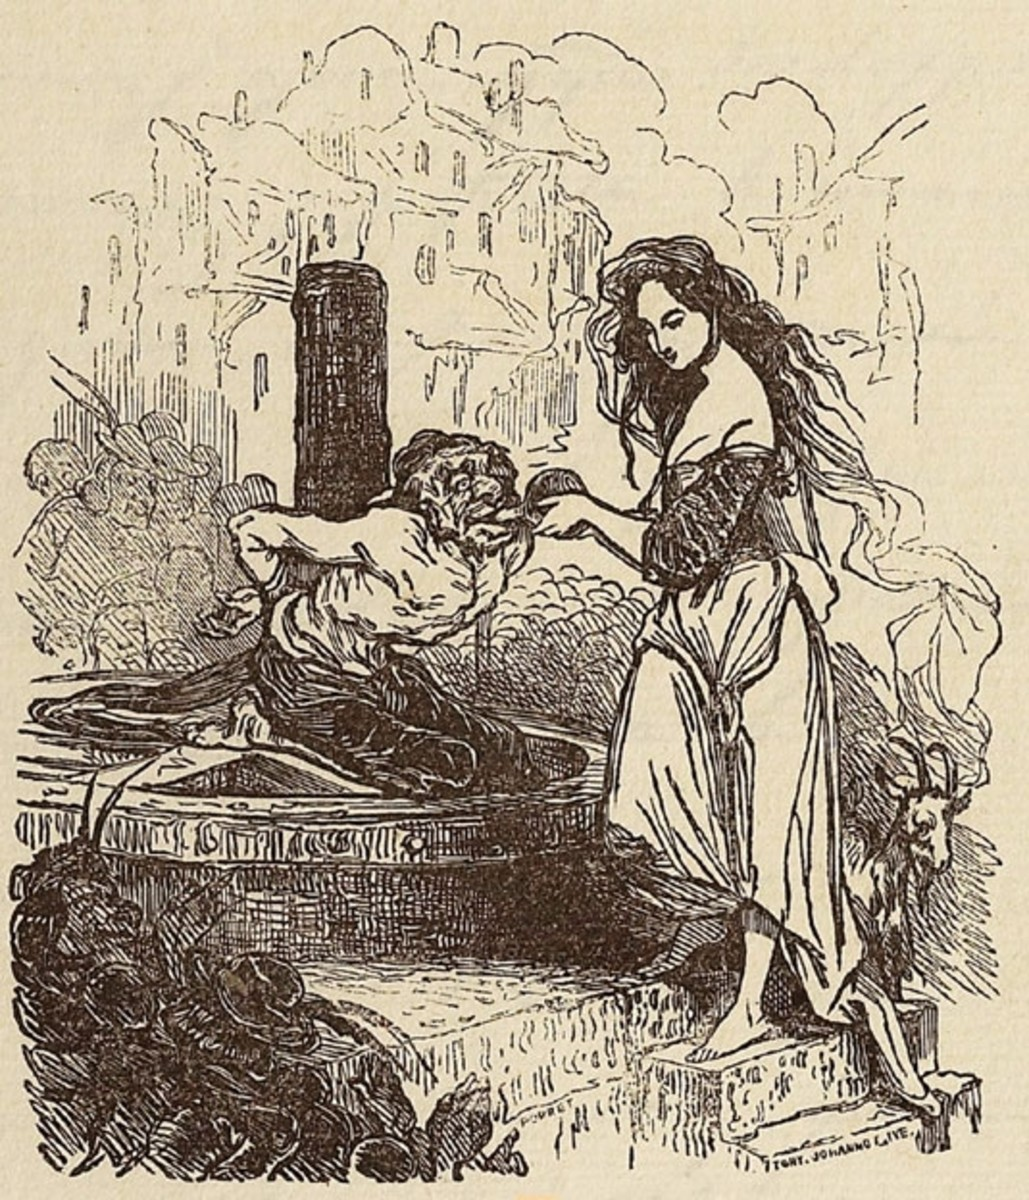 Esmeralda giving Quasimodo water Tony Johannot